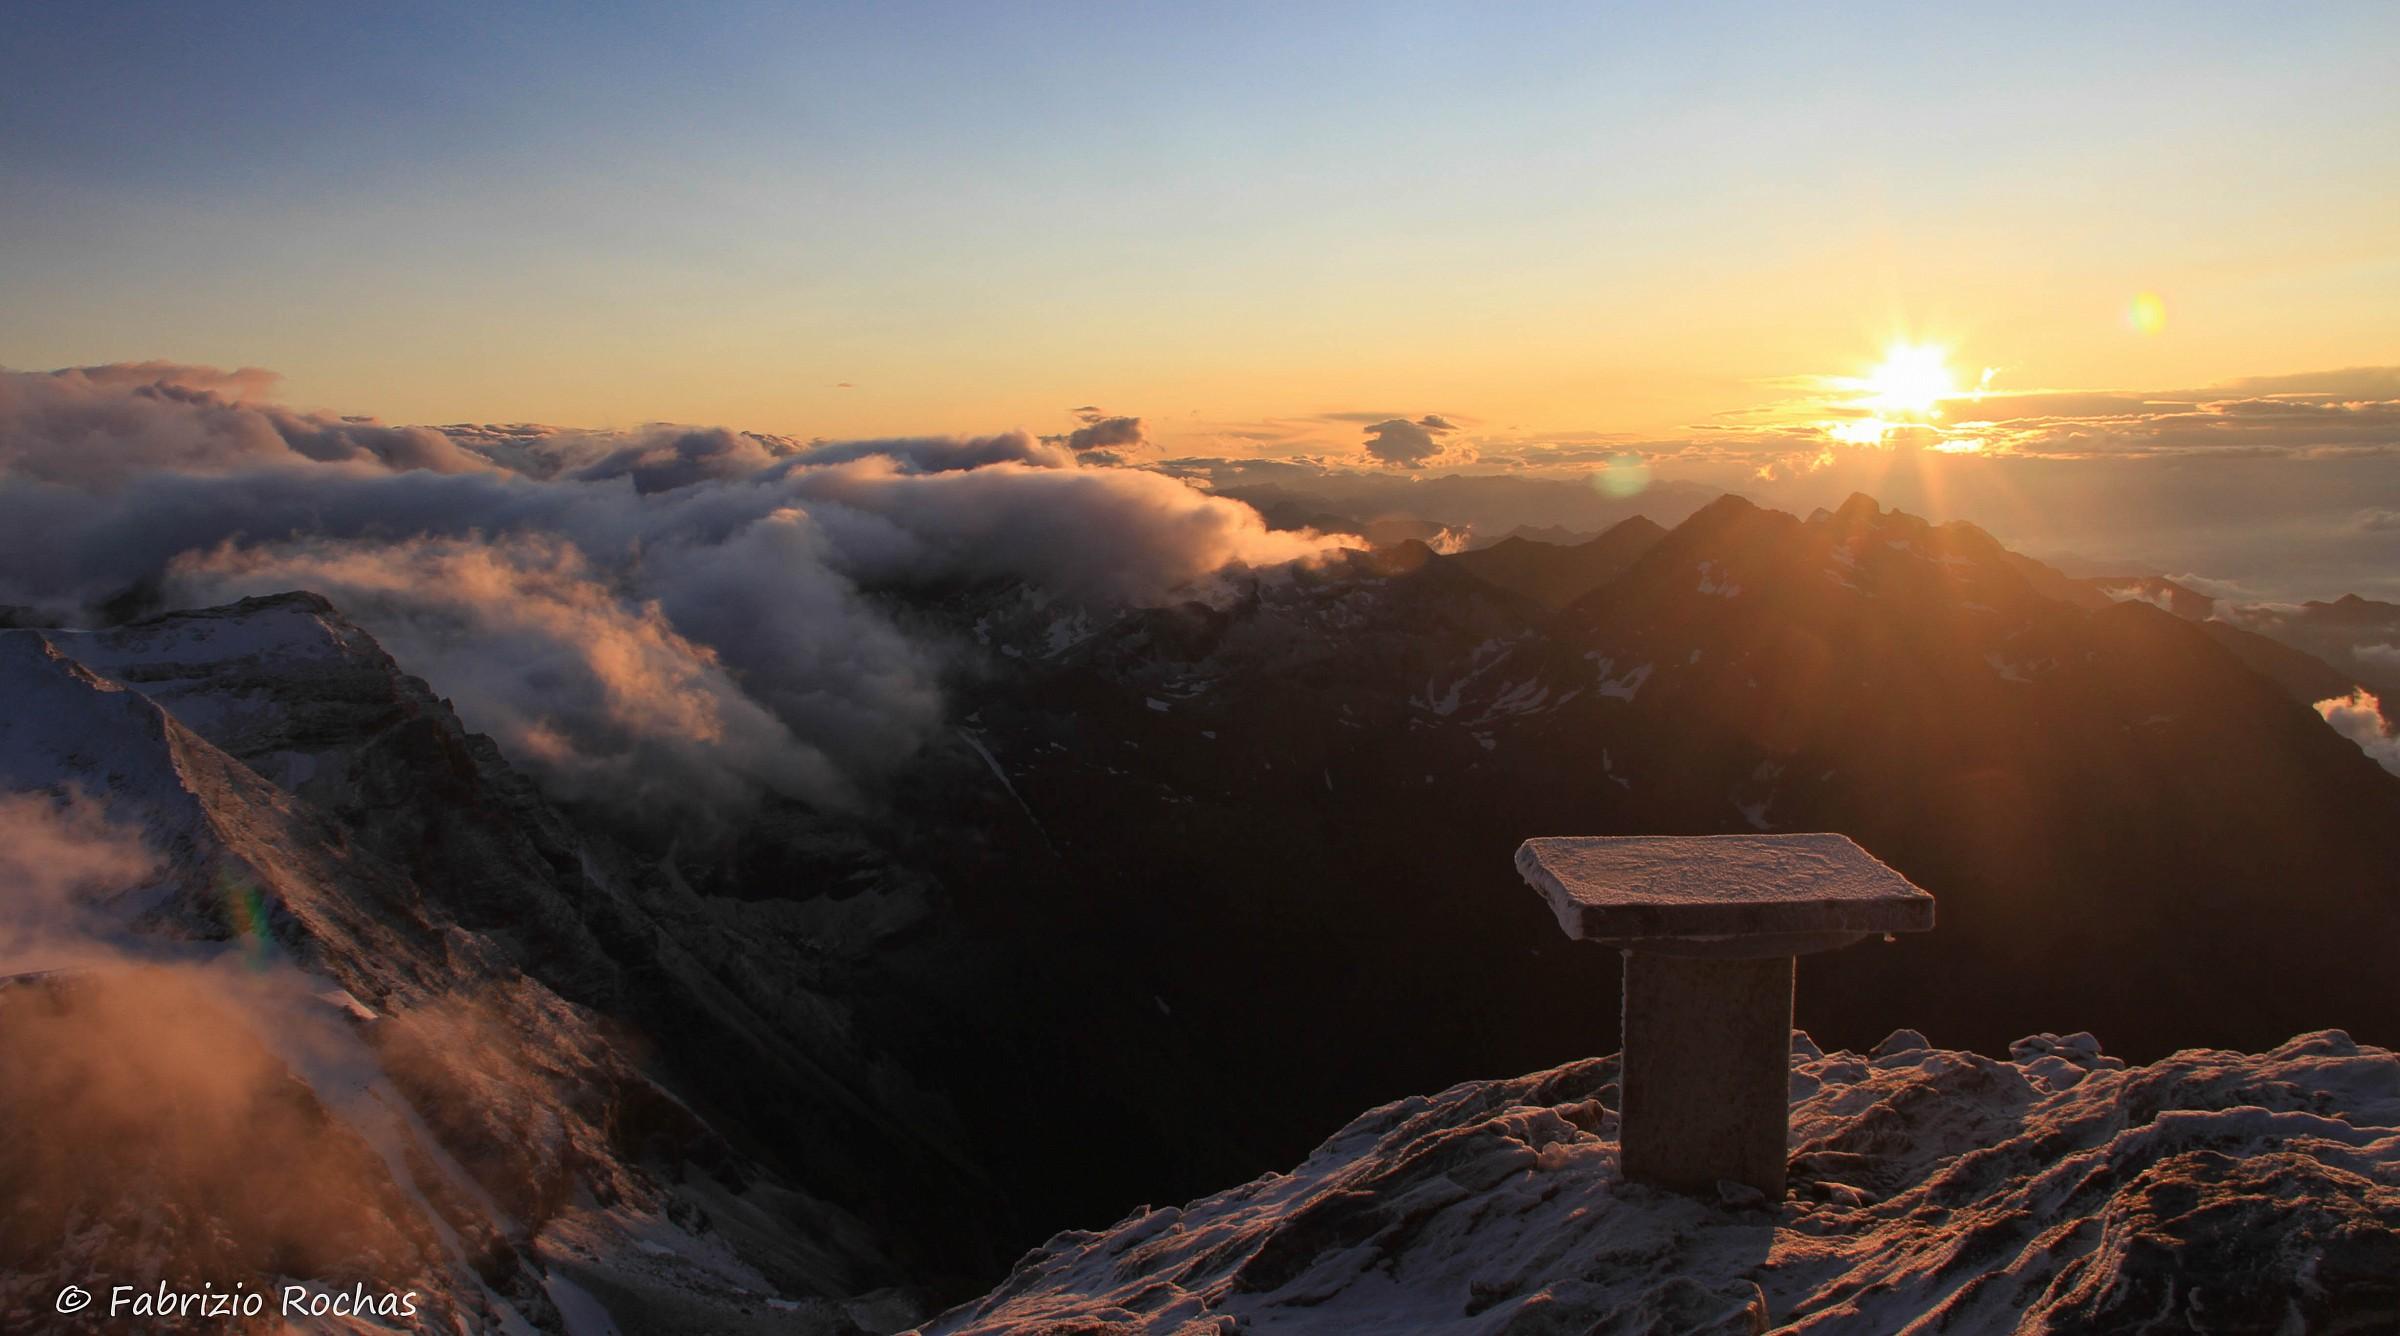 Alba 3600 meters above sea level...